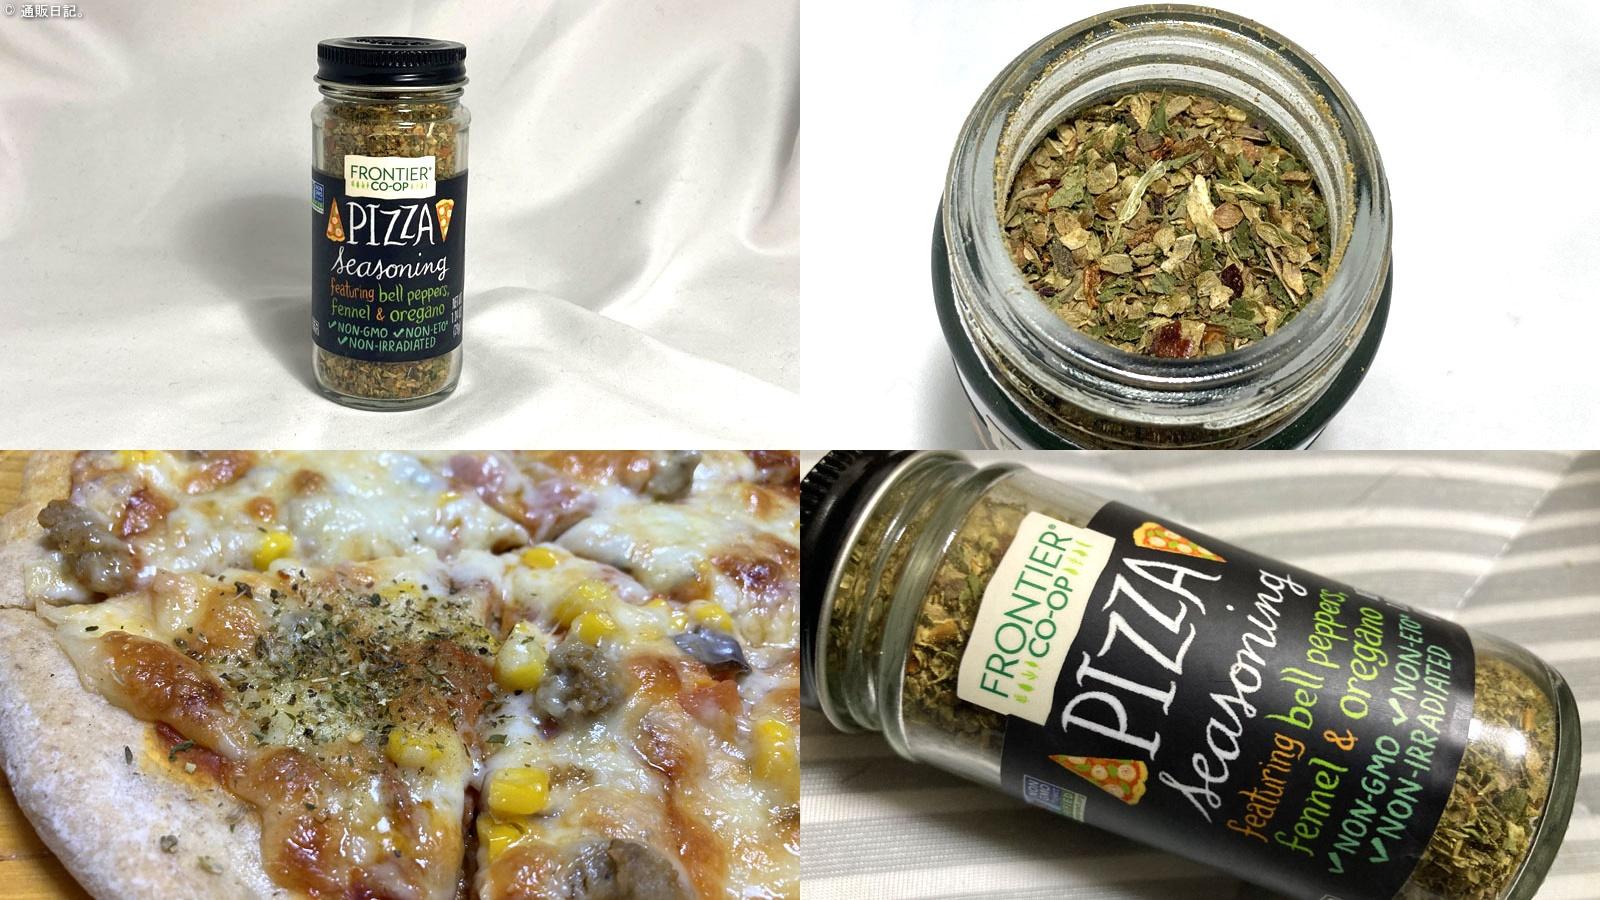 Frontier Natural ProductsのPIZZA Seasoning(ピザ用シーズニング)ピザ専用スパイスが美味い!